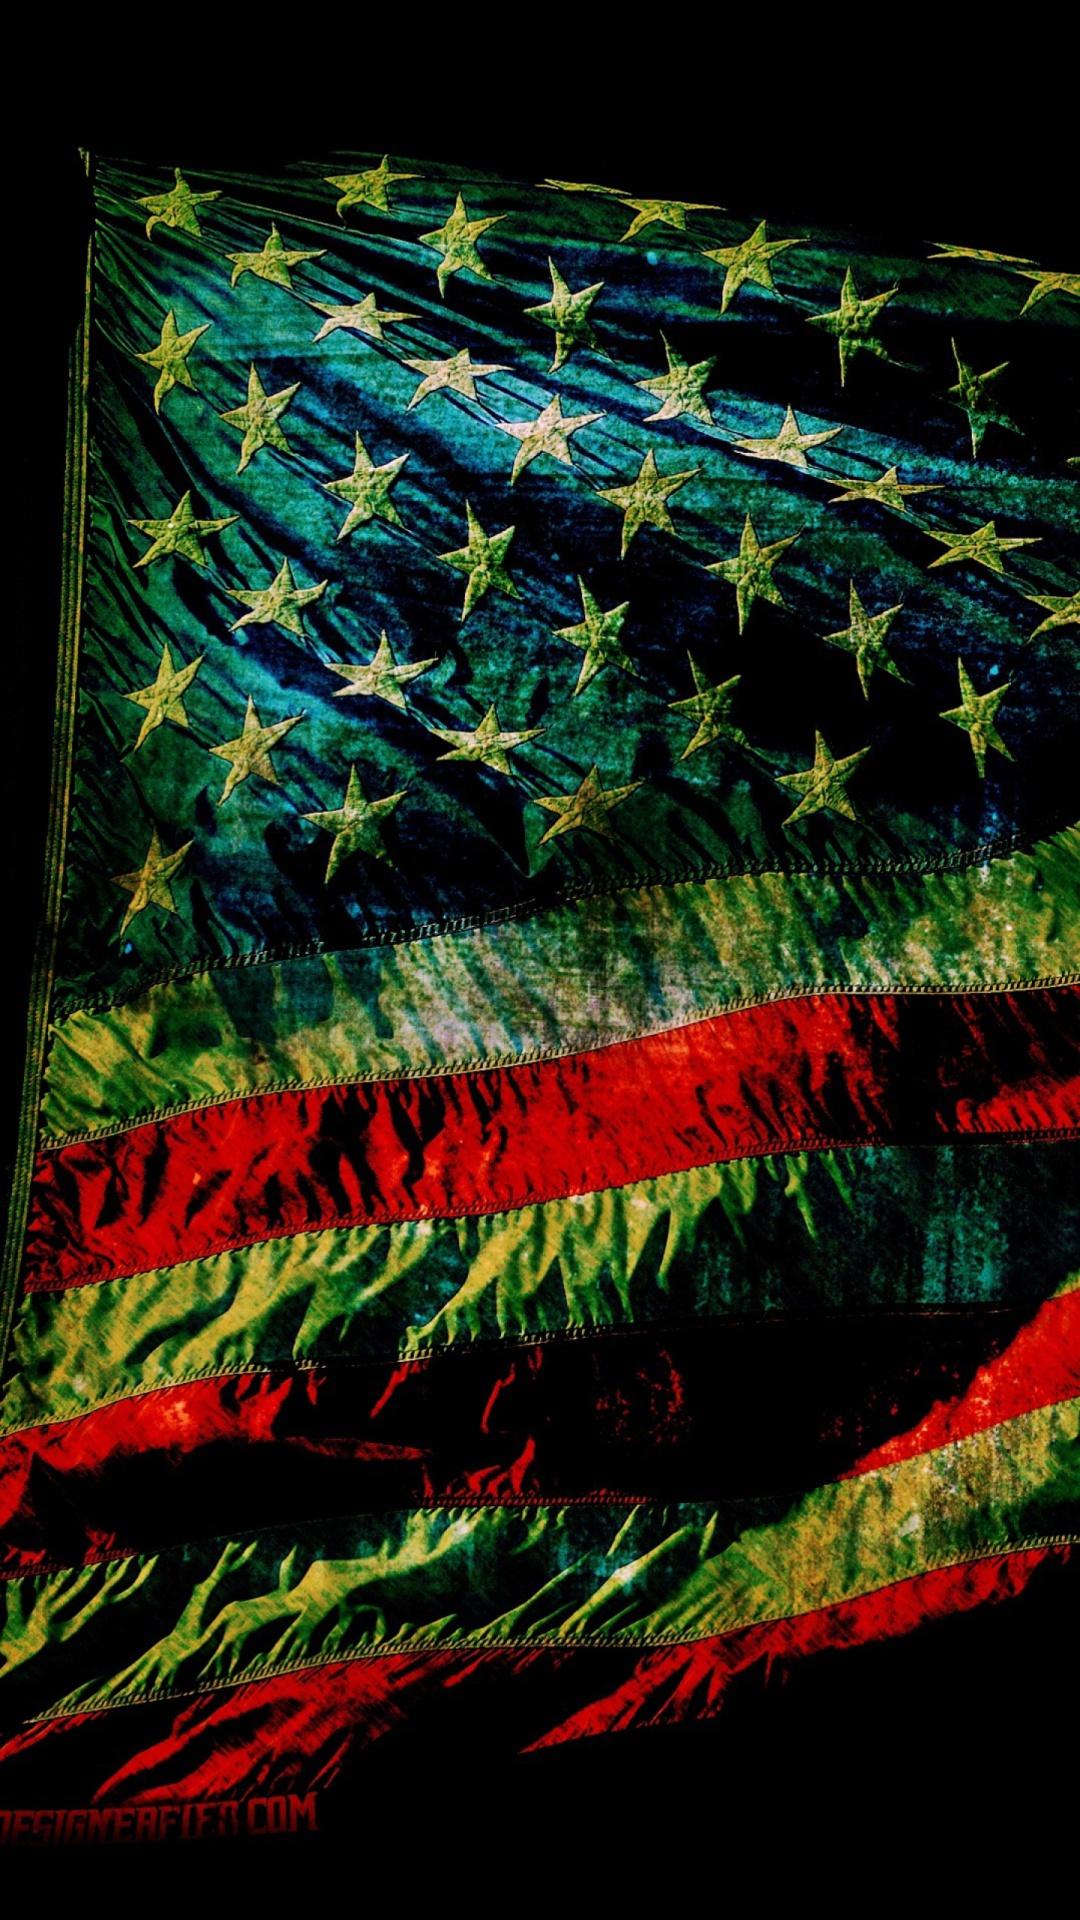 Inspirational Quotes Wallpaper Desktop American Flag Hd Iphone Wallpapers Pixelstalk Net